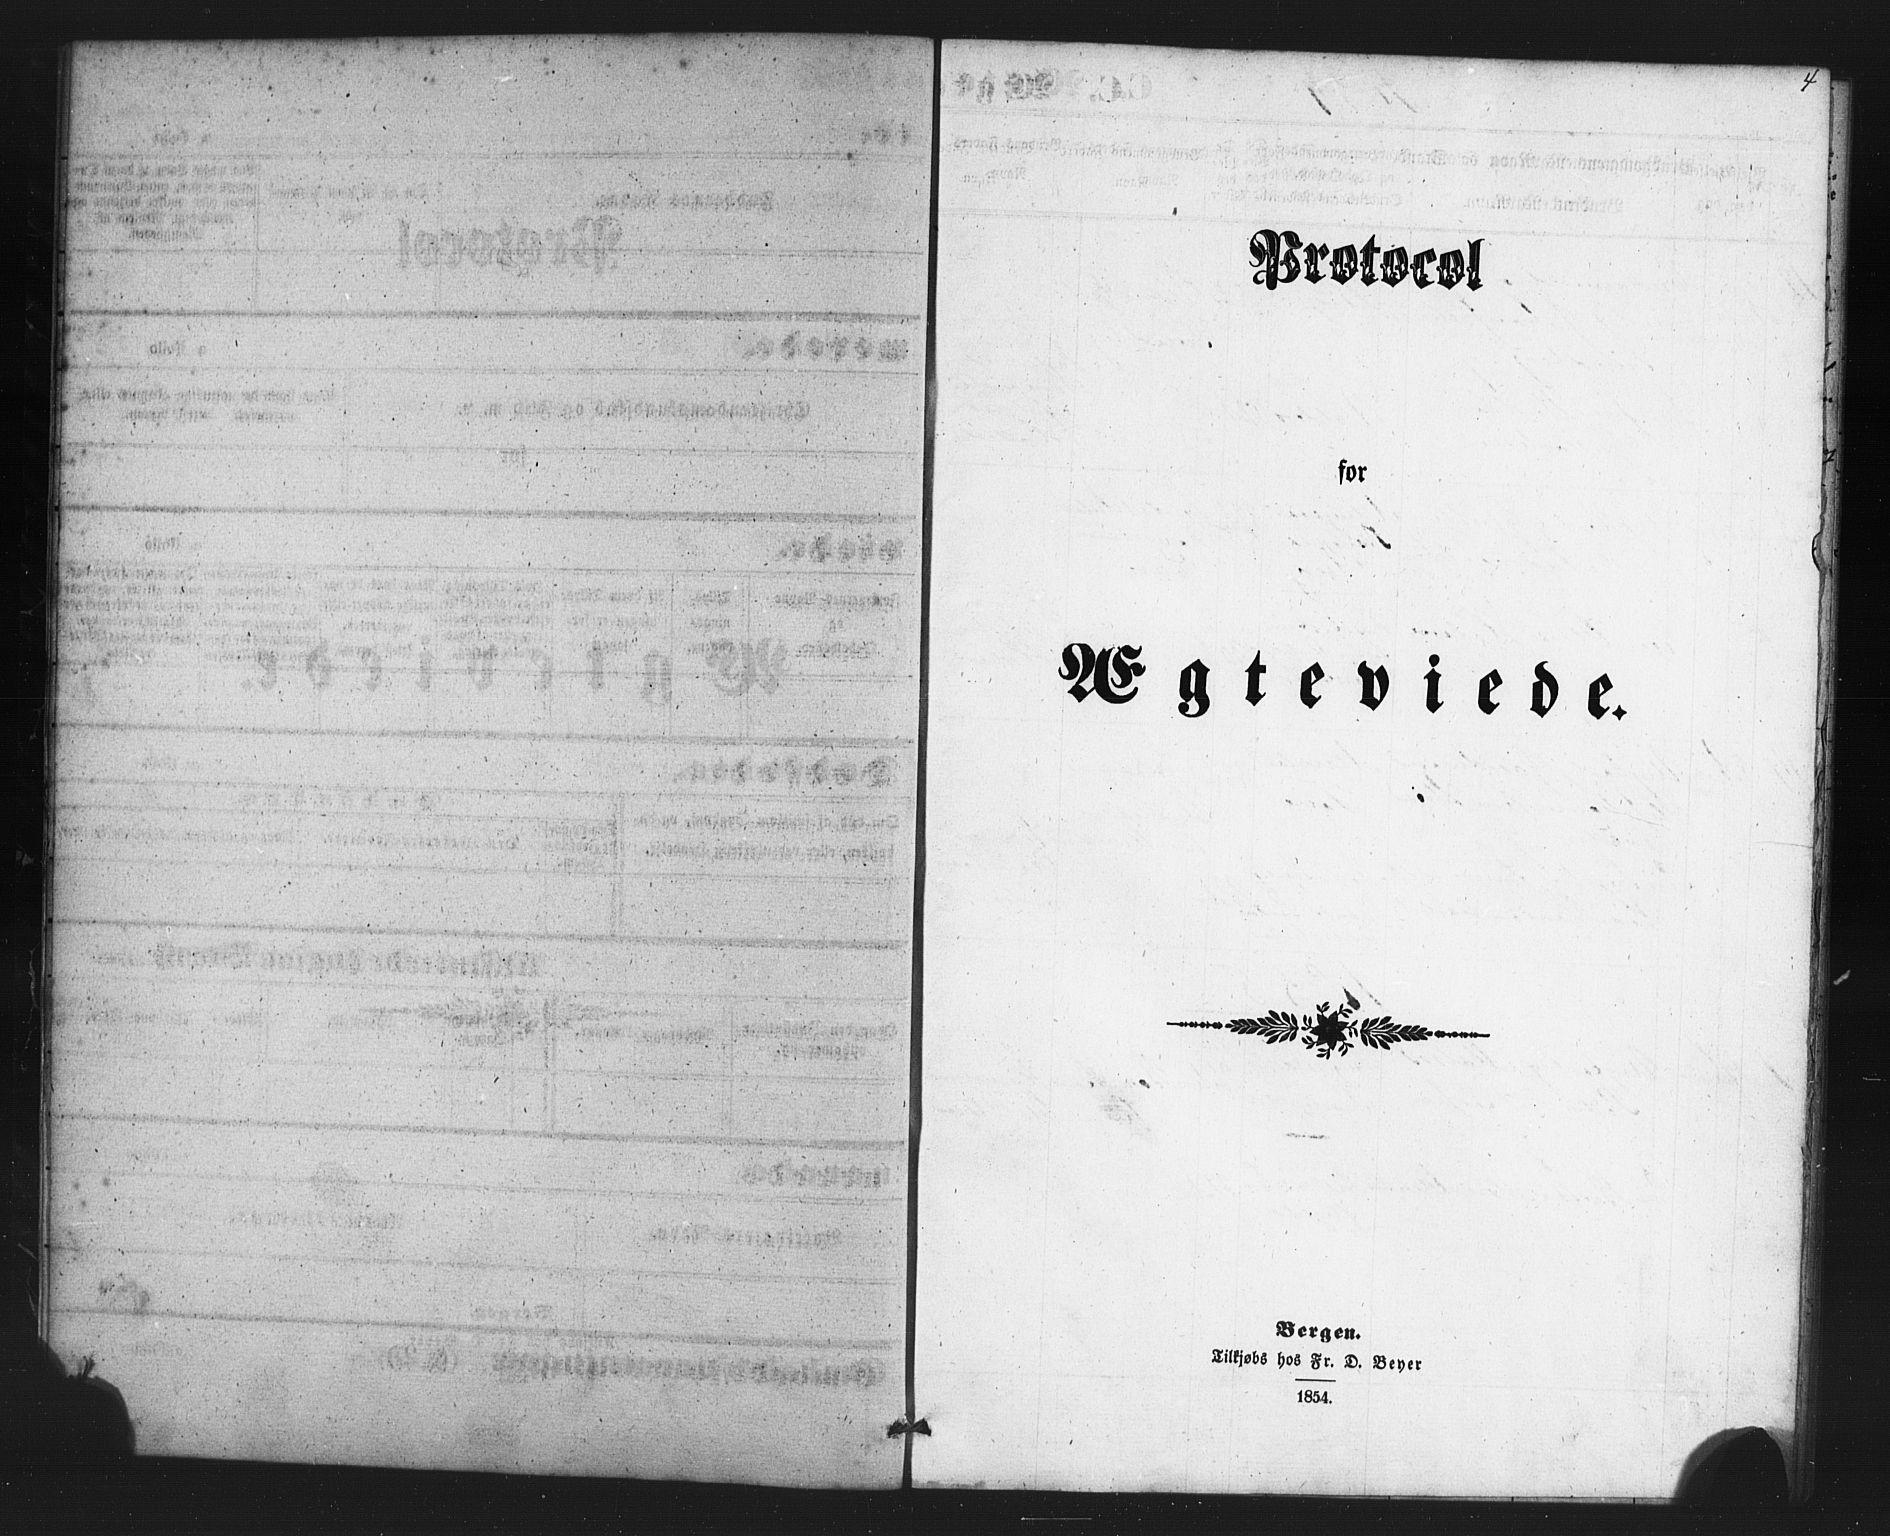 SAB, St. Jørgens hospital og Årstad sokneprestembete, Klokkerbok nr. A 7, 1854-1886, s. 4